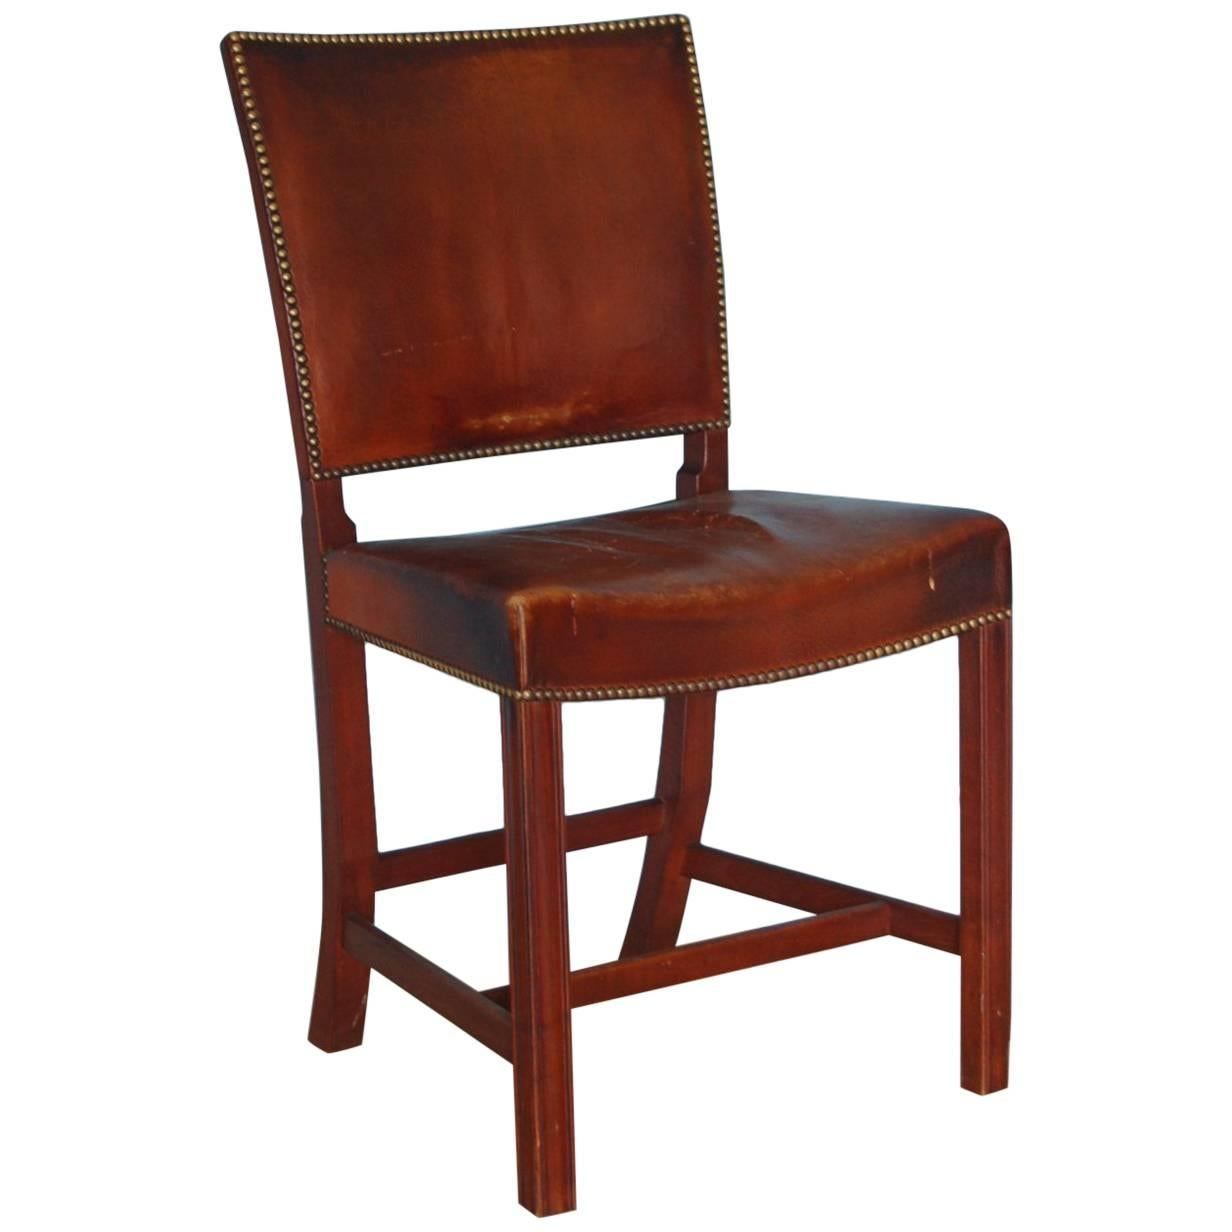 Jacob Kjaer Chair, Mahogany Frame + Original Niger Leather, circa 1930